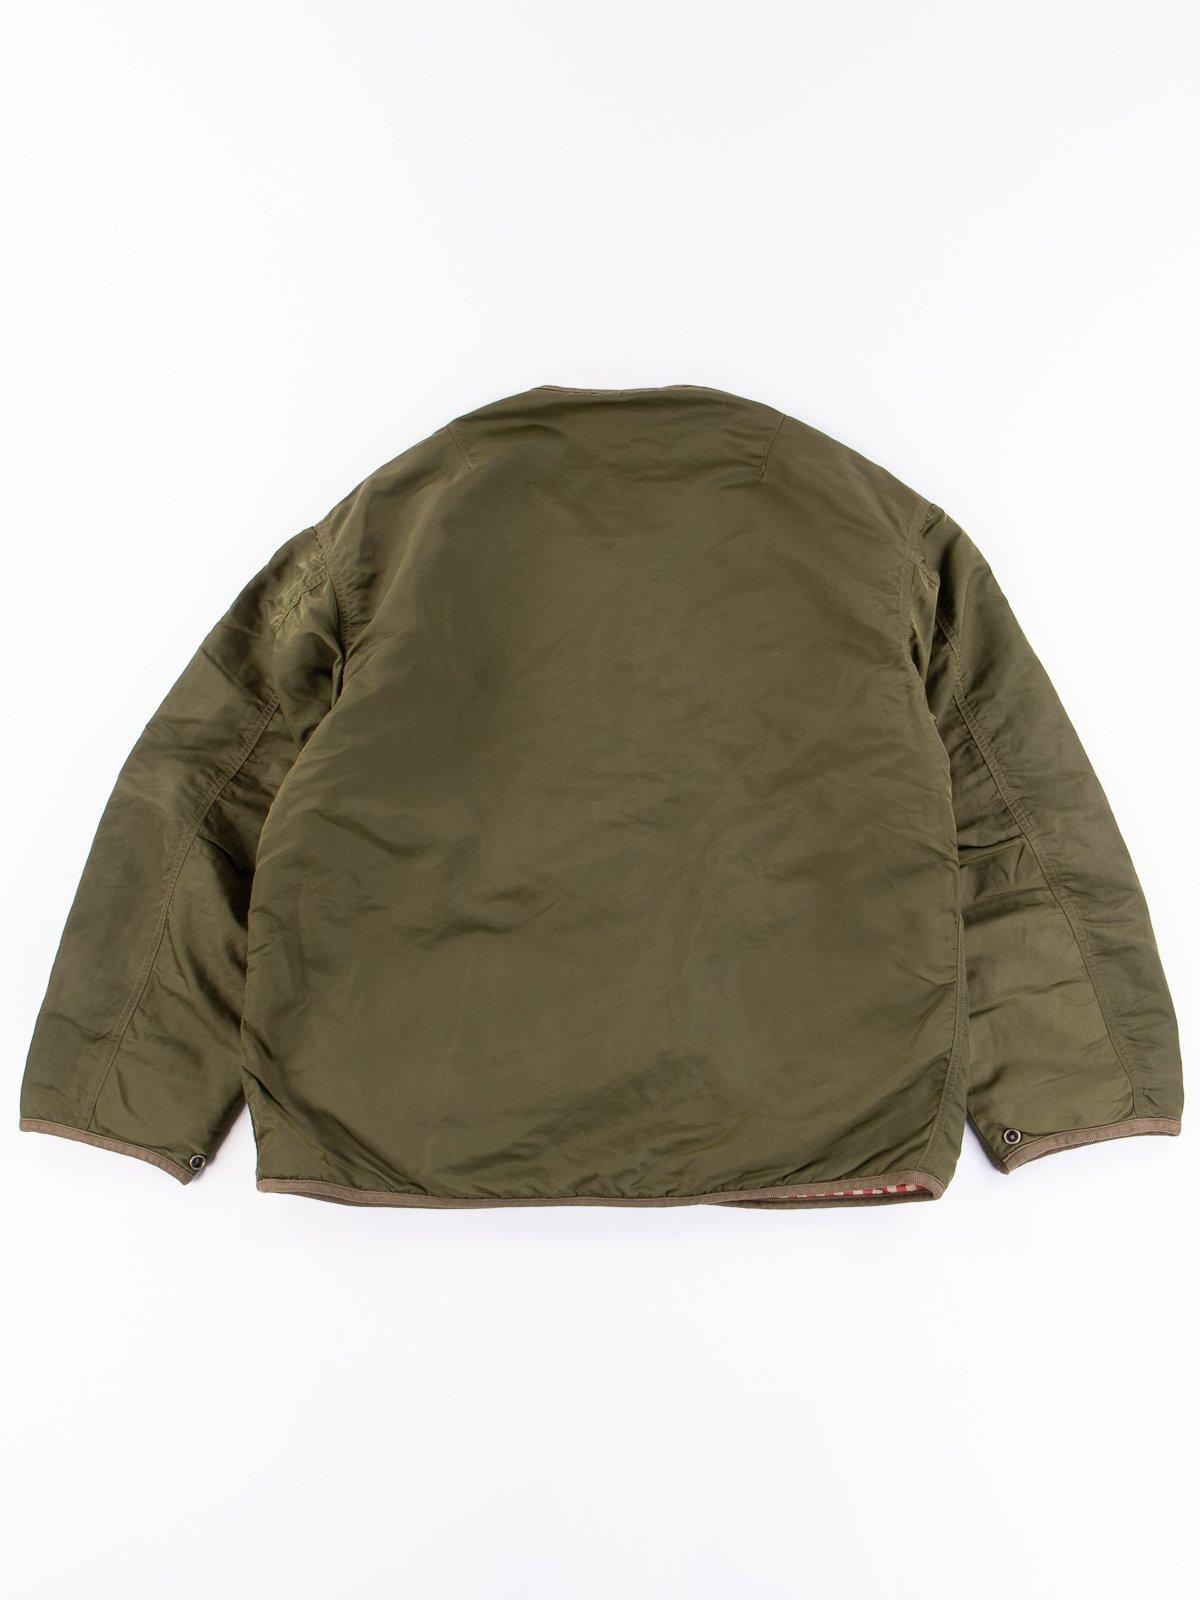 Olive Iris Liner Jacket - Image 5